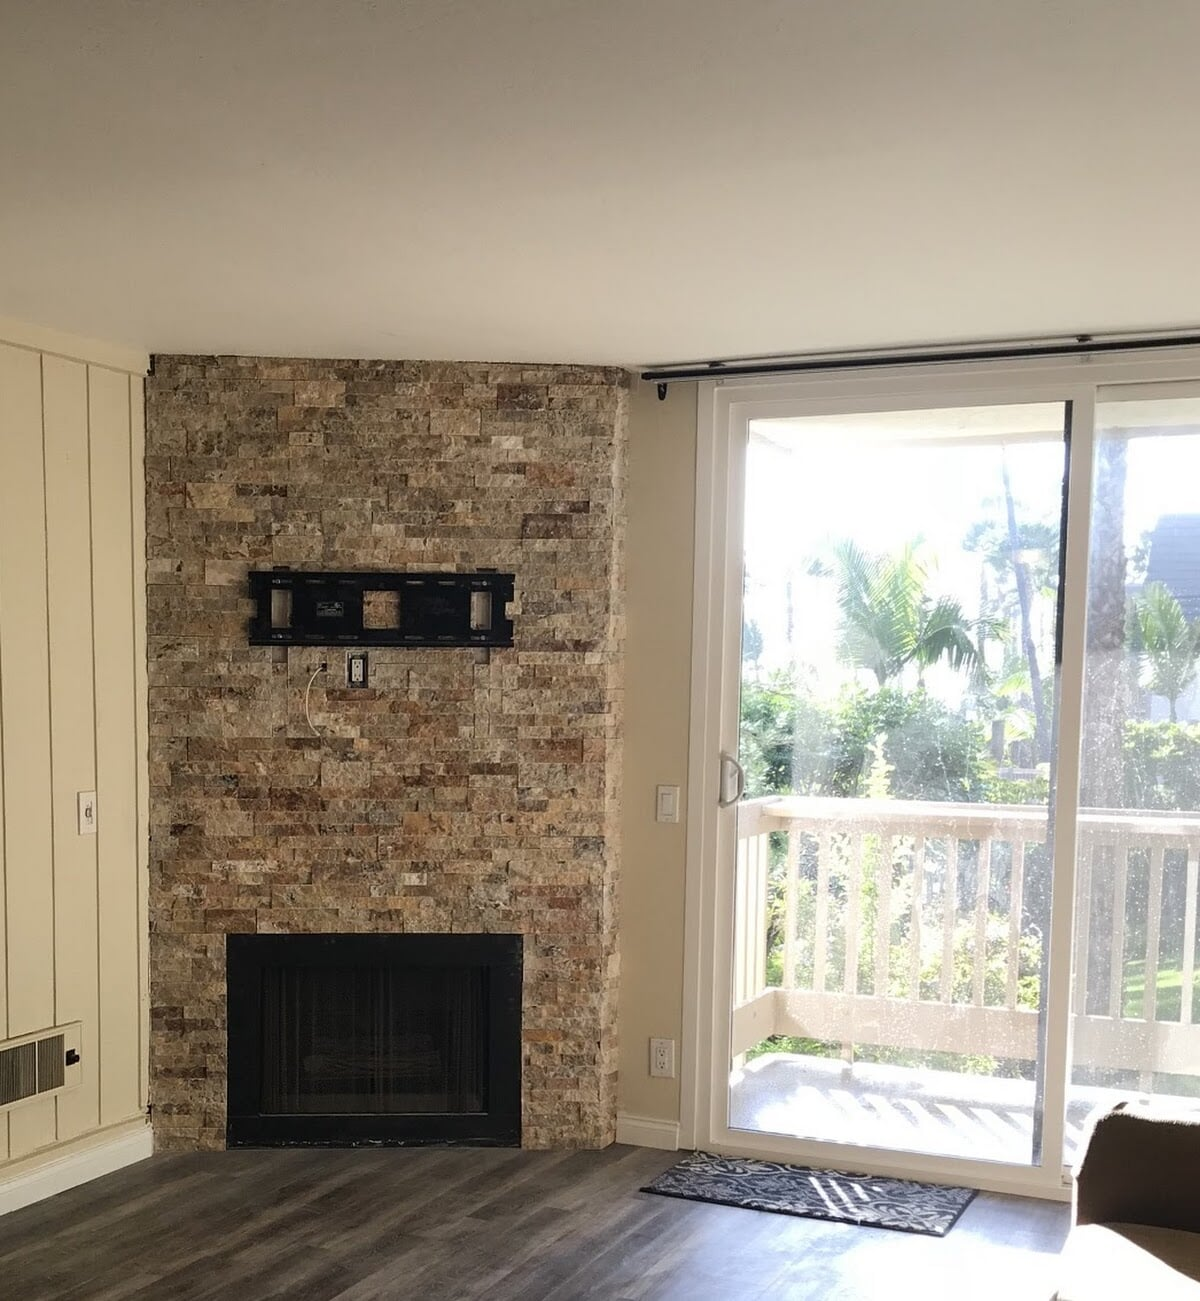 Stone fireplace installation in Carlsbad, CA from Savon Flooring